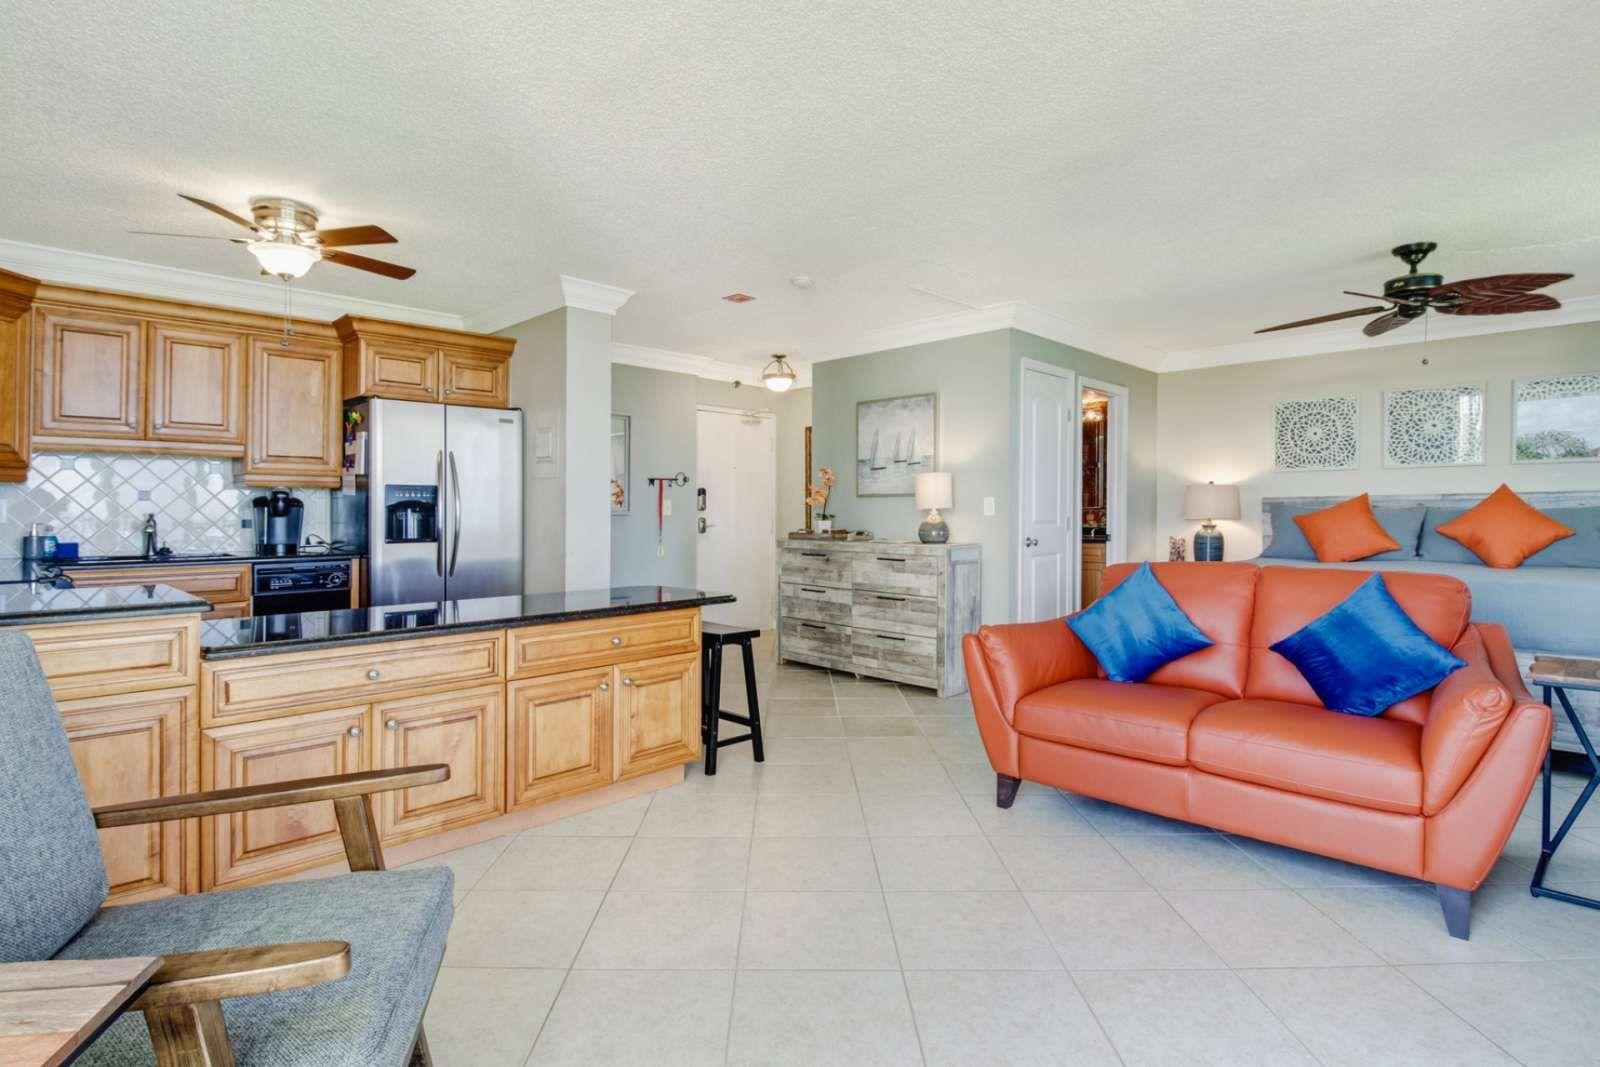 Fort Myers Beach Vacation Rental Studio Condo Beach Vacation Rentals Home